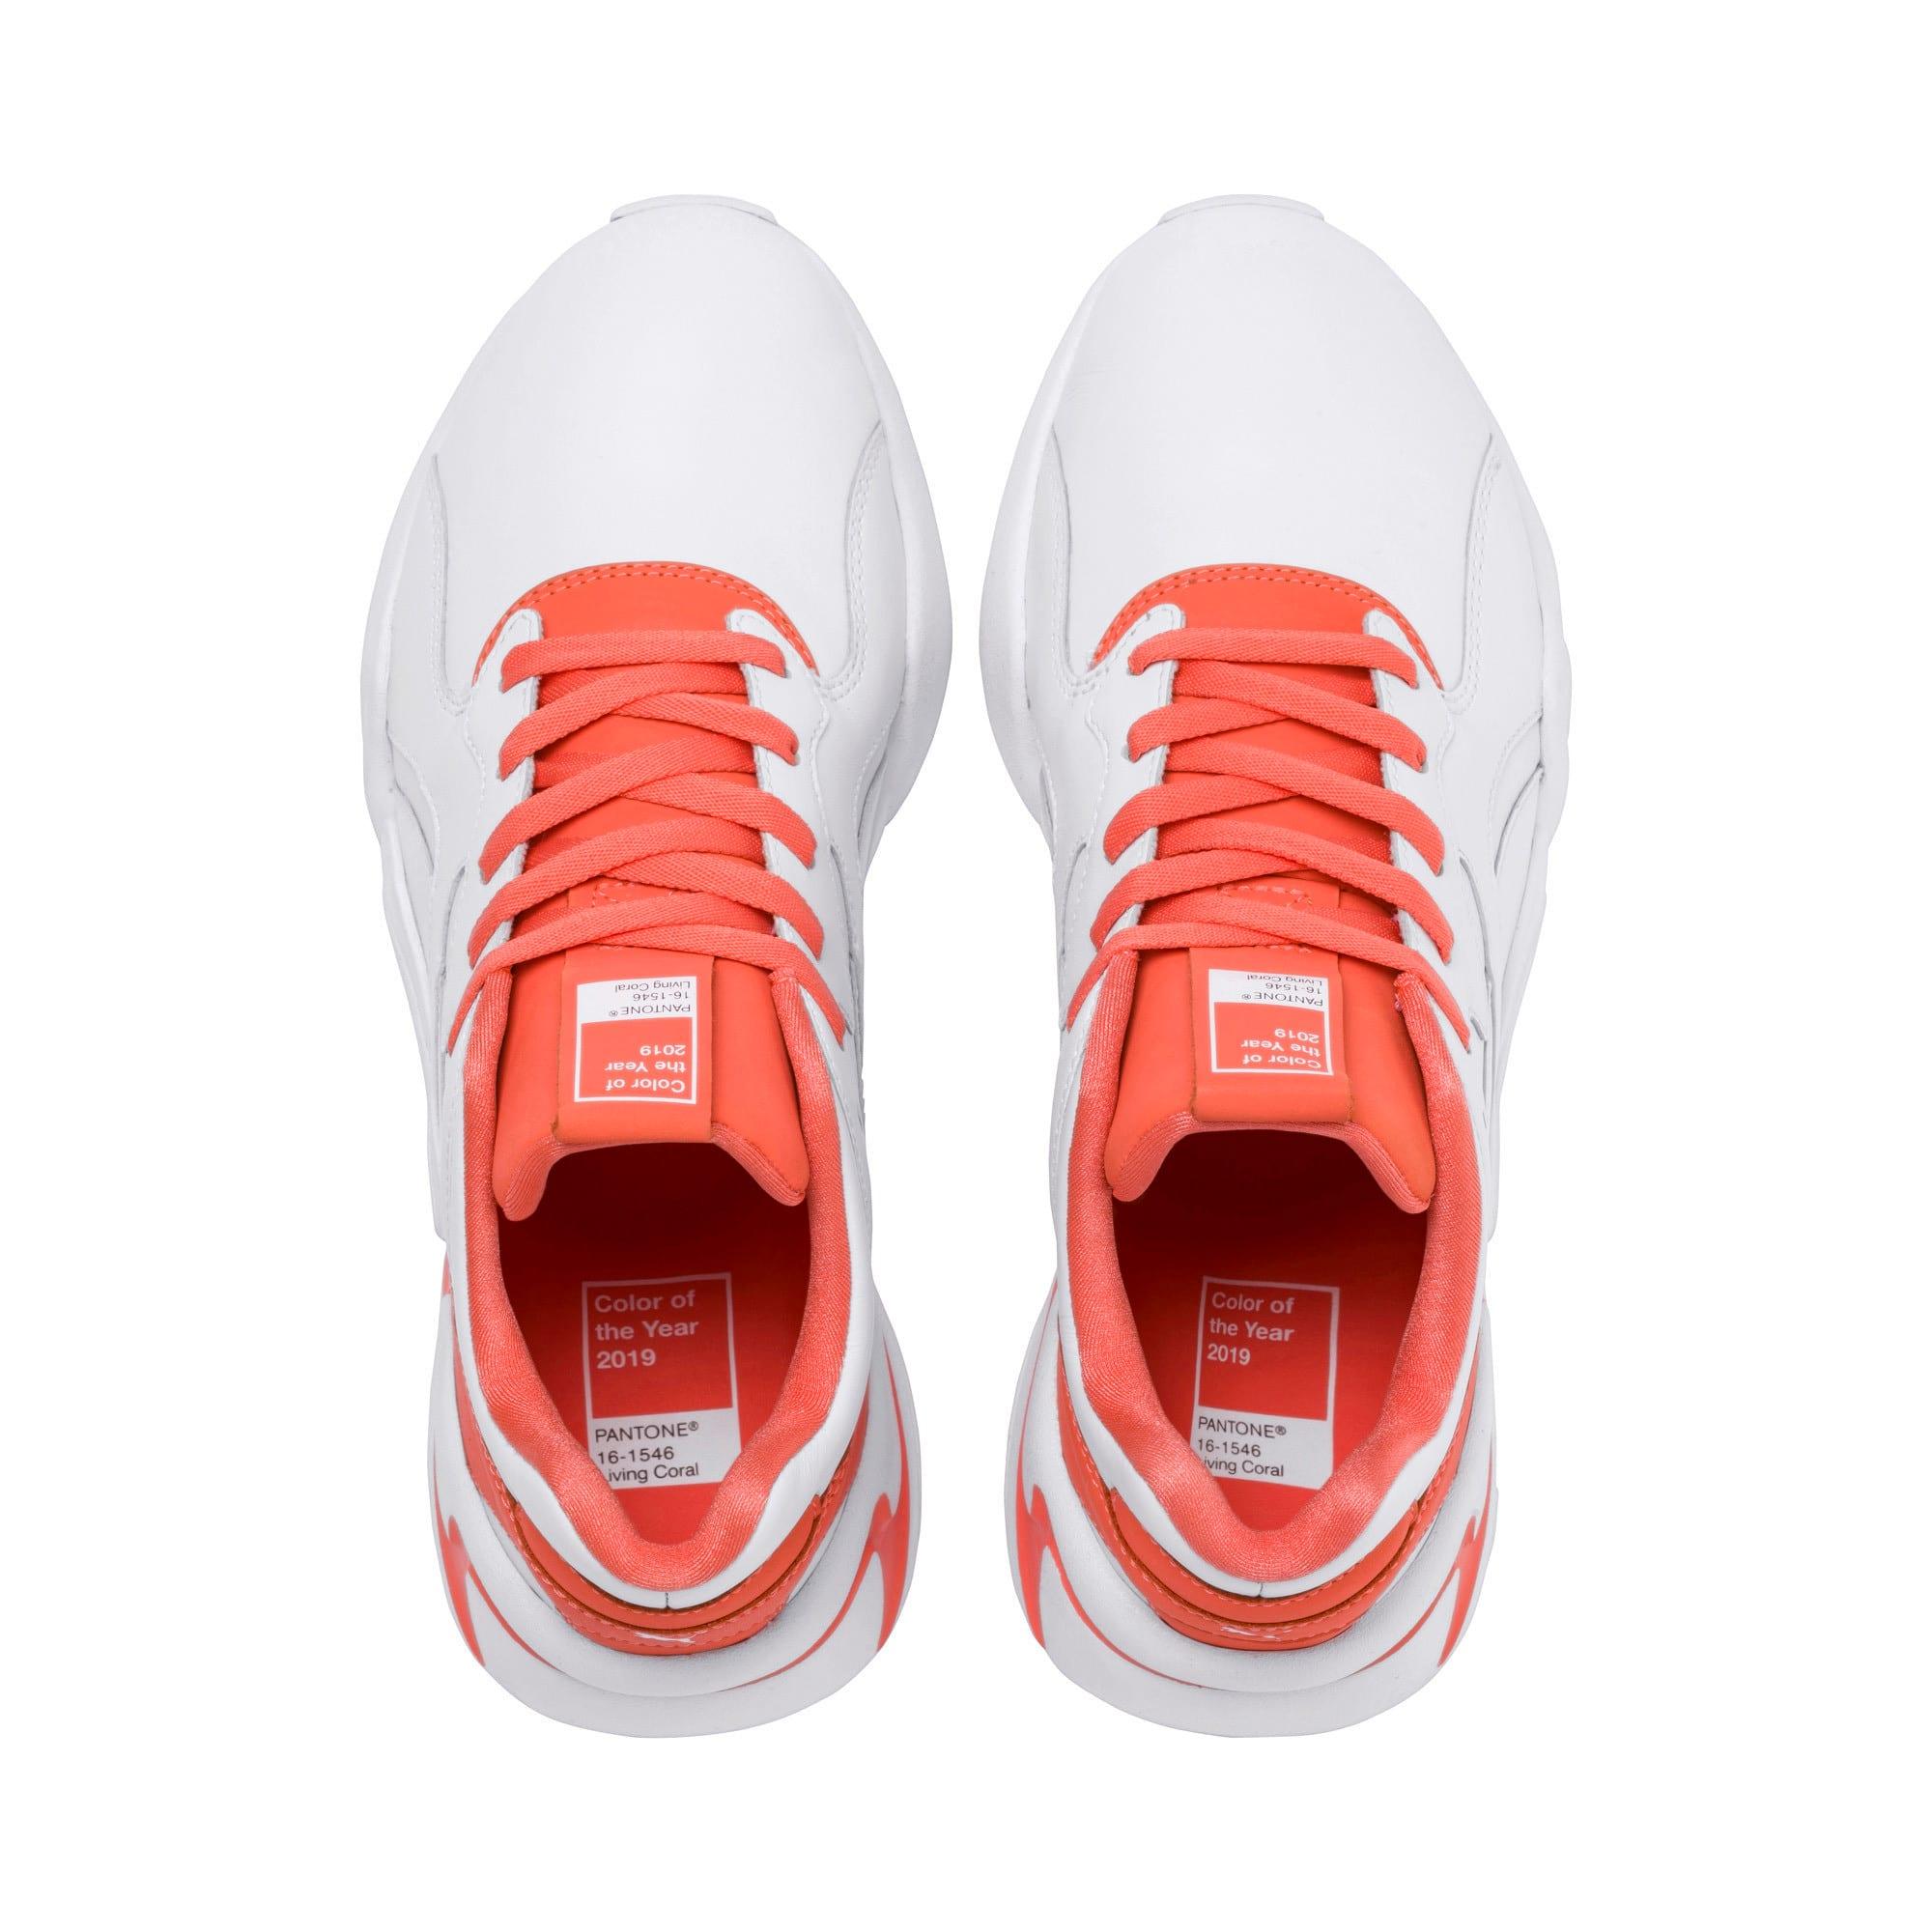 Thumbnail 6 of Nova x Pantone 2 Women's Sneakers, Puma White-Living Coral, medium